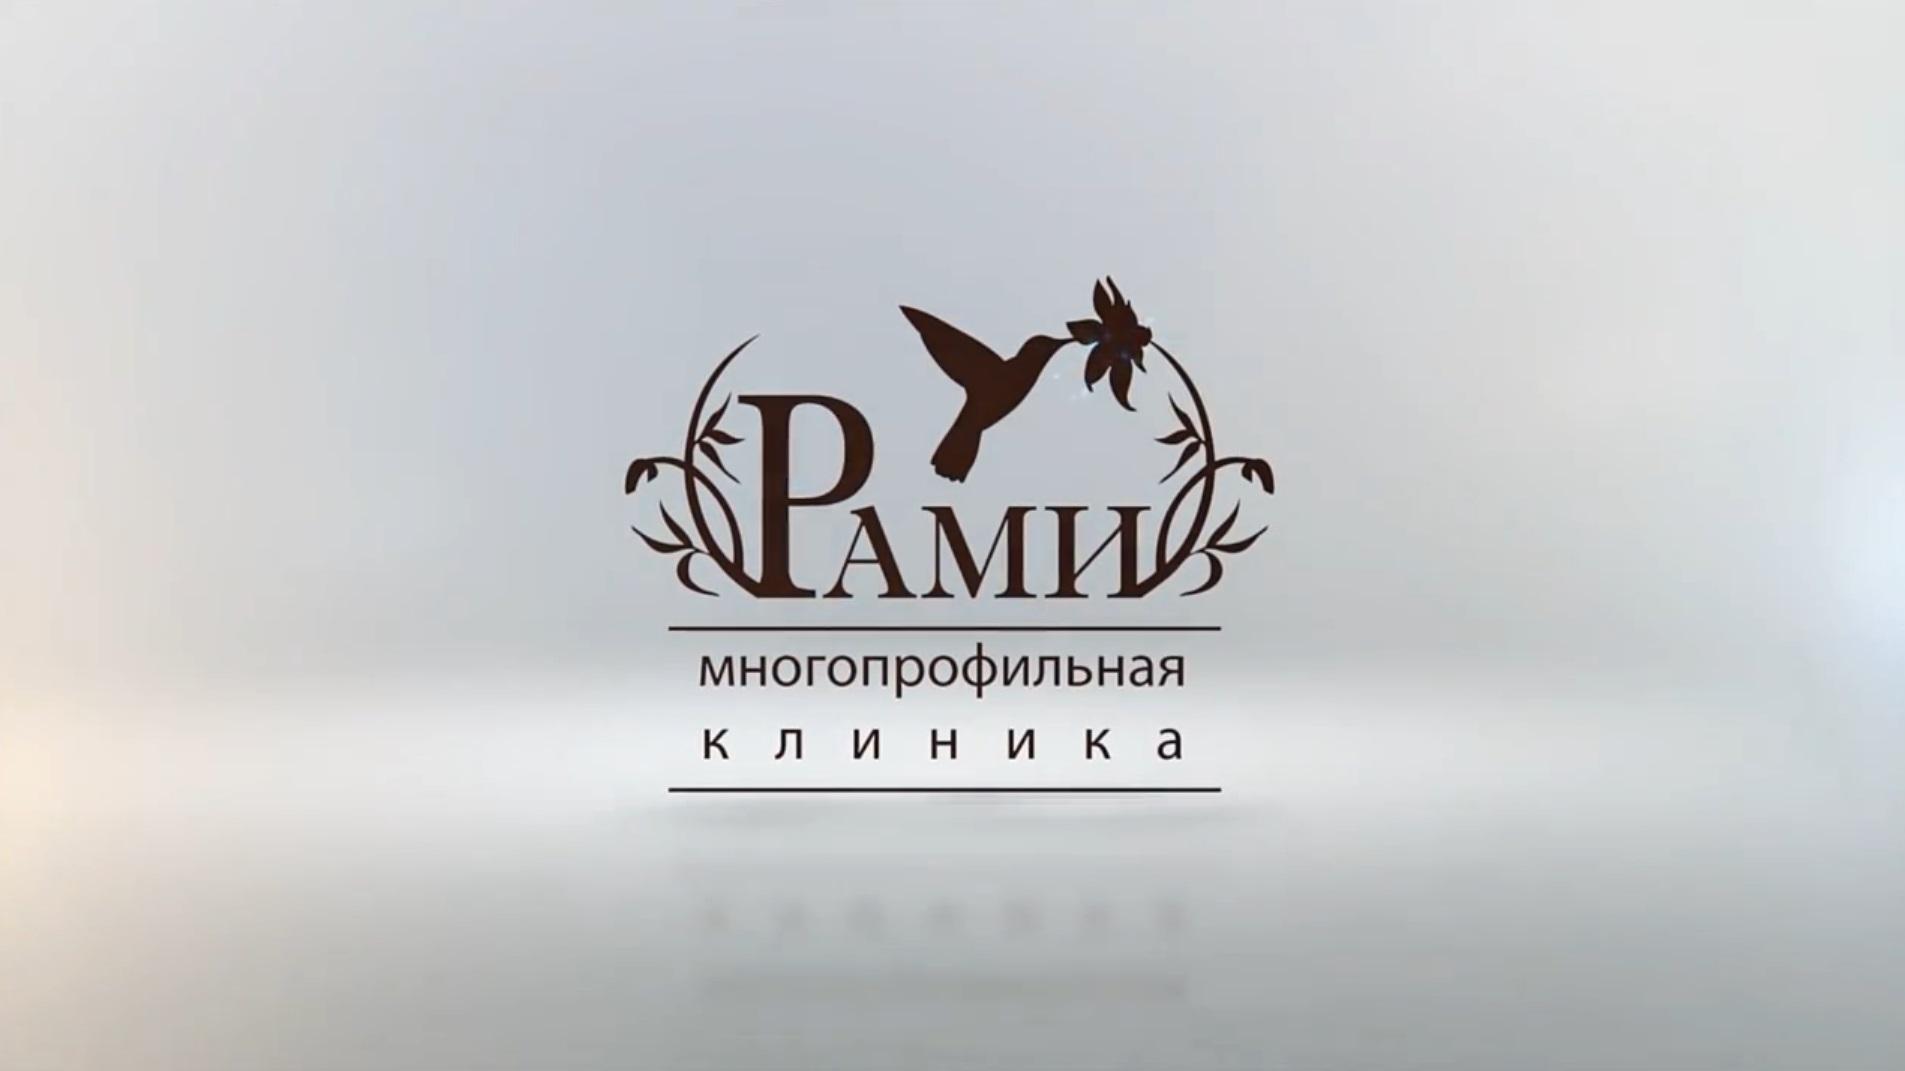 Rami Clinic